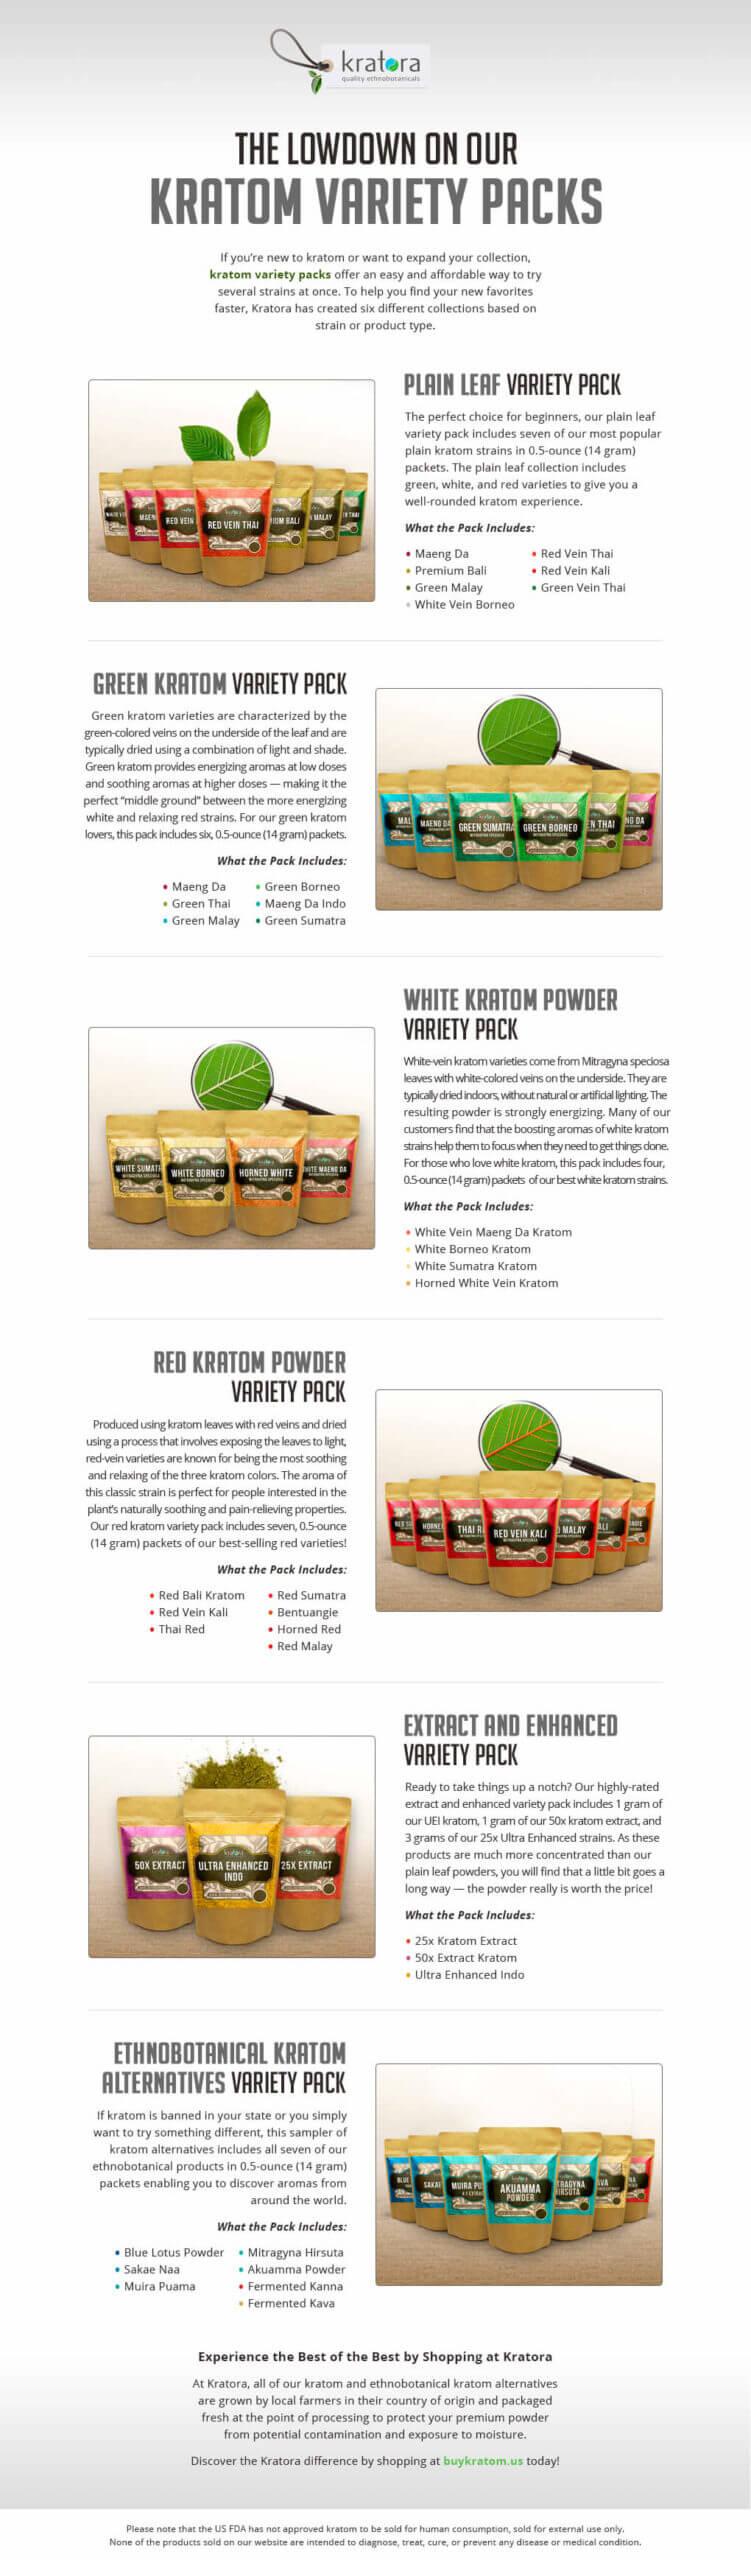 Infographic_LowdownKratomVarietyPacks_Kratora_V1R2 (1)